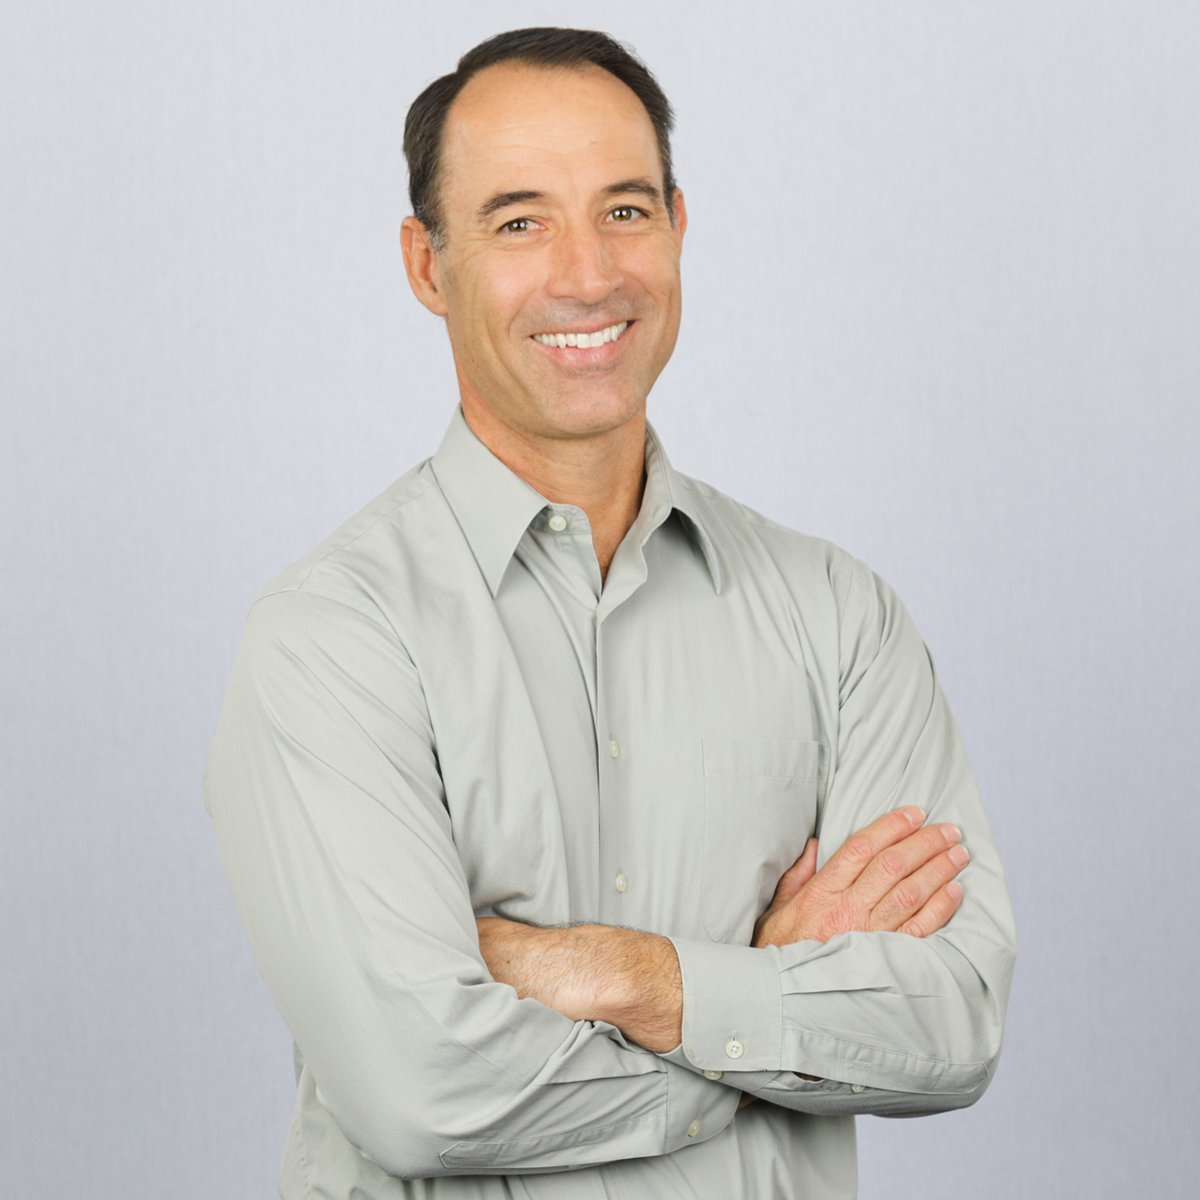 Matt Archer, Chief Operating Officer